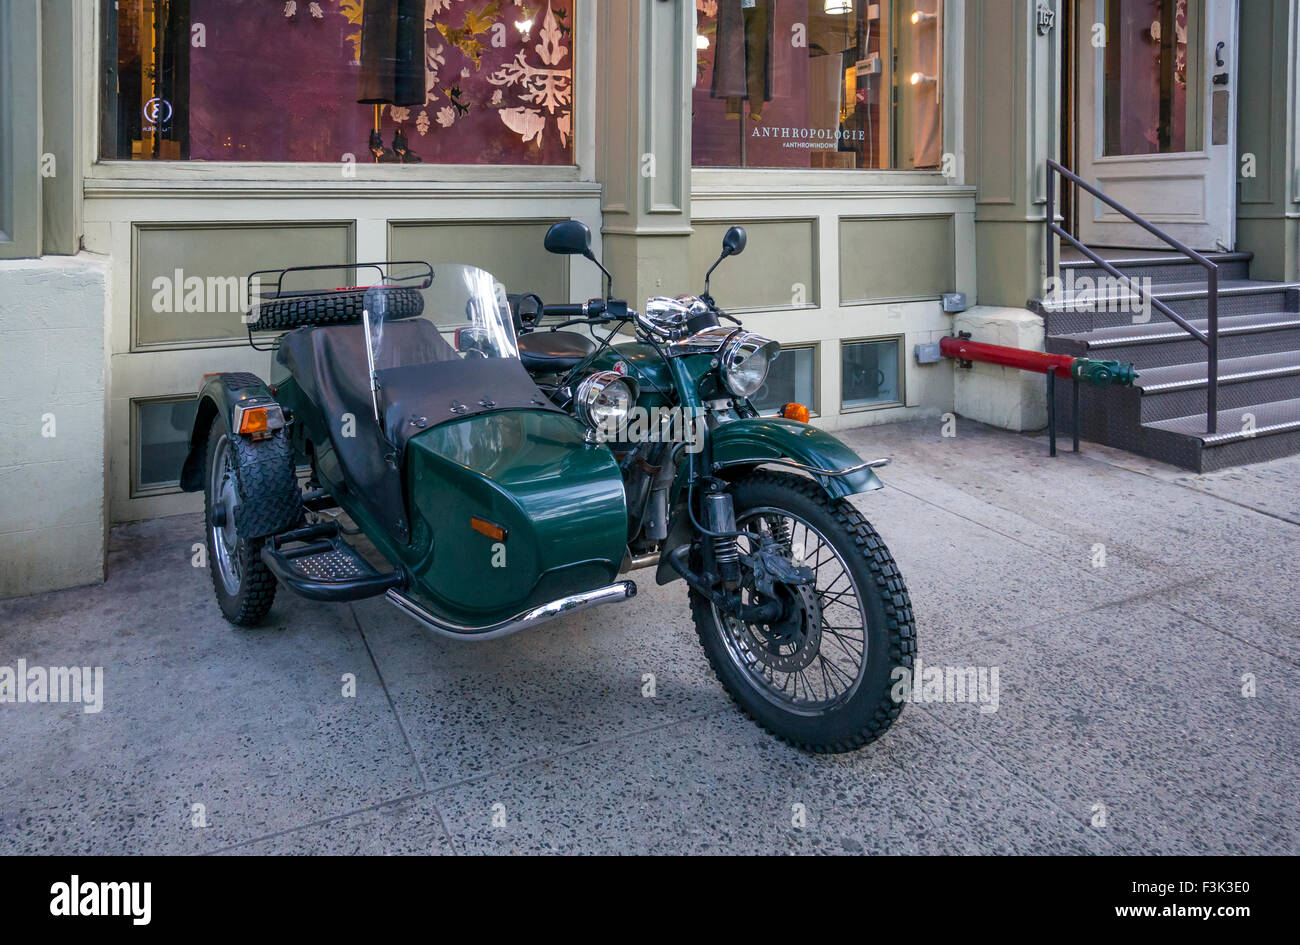 ural motorrad mit beiwagen stockfoto bild 88315640 alamy. Black Bedroom Furniture Sets. Home Design Ideas